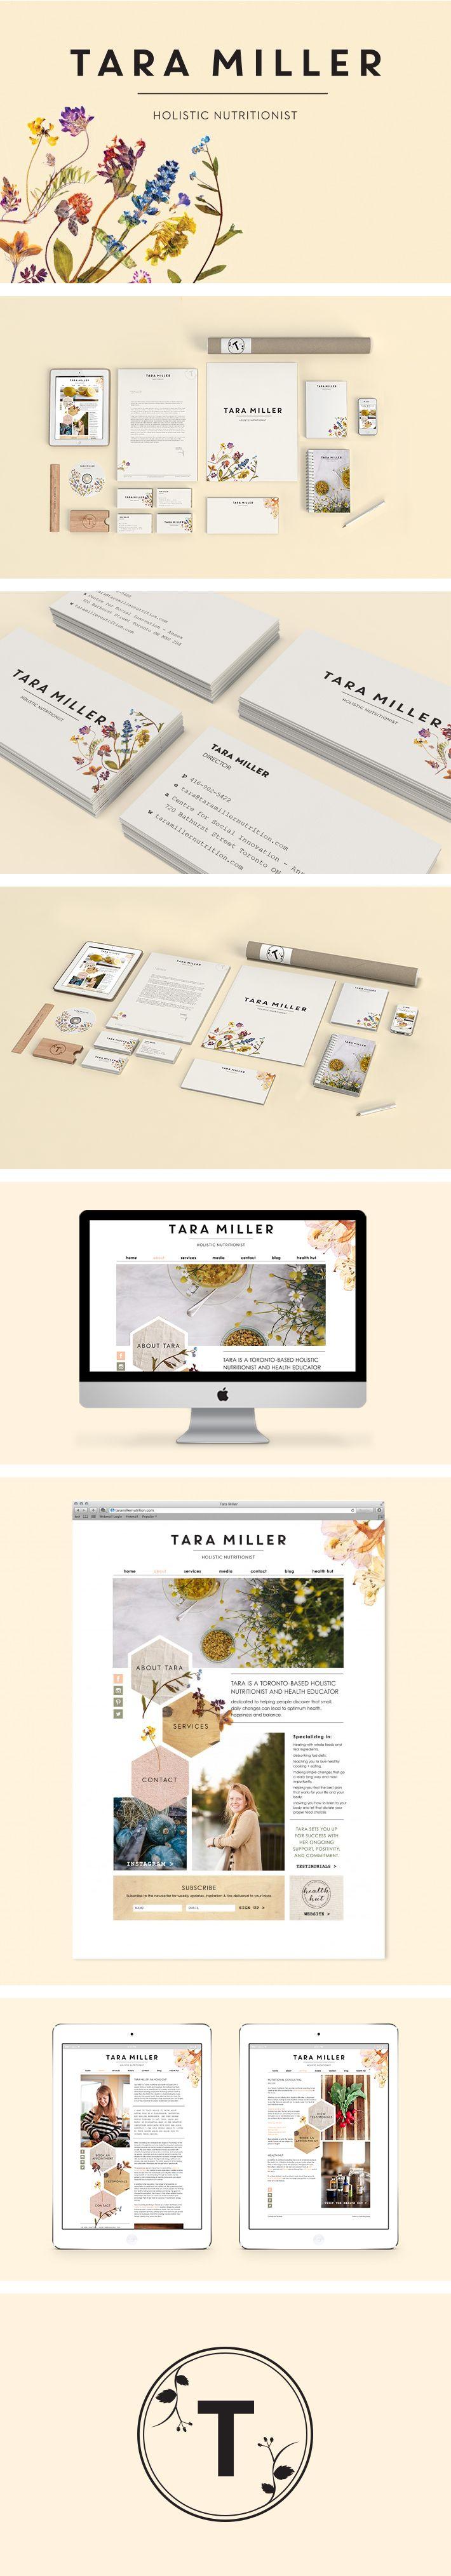 Tara Miller branding by Smack Bang Designs #Branding #BusinessCards #Stationary #Website #GraphicDesign #SmackBangDesigns